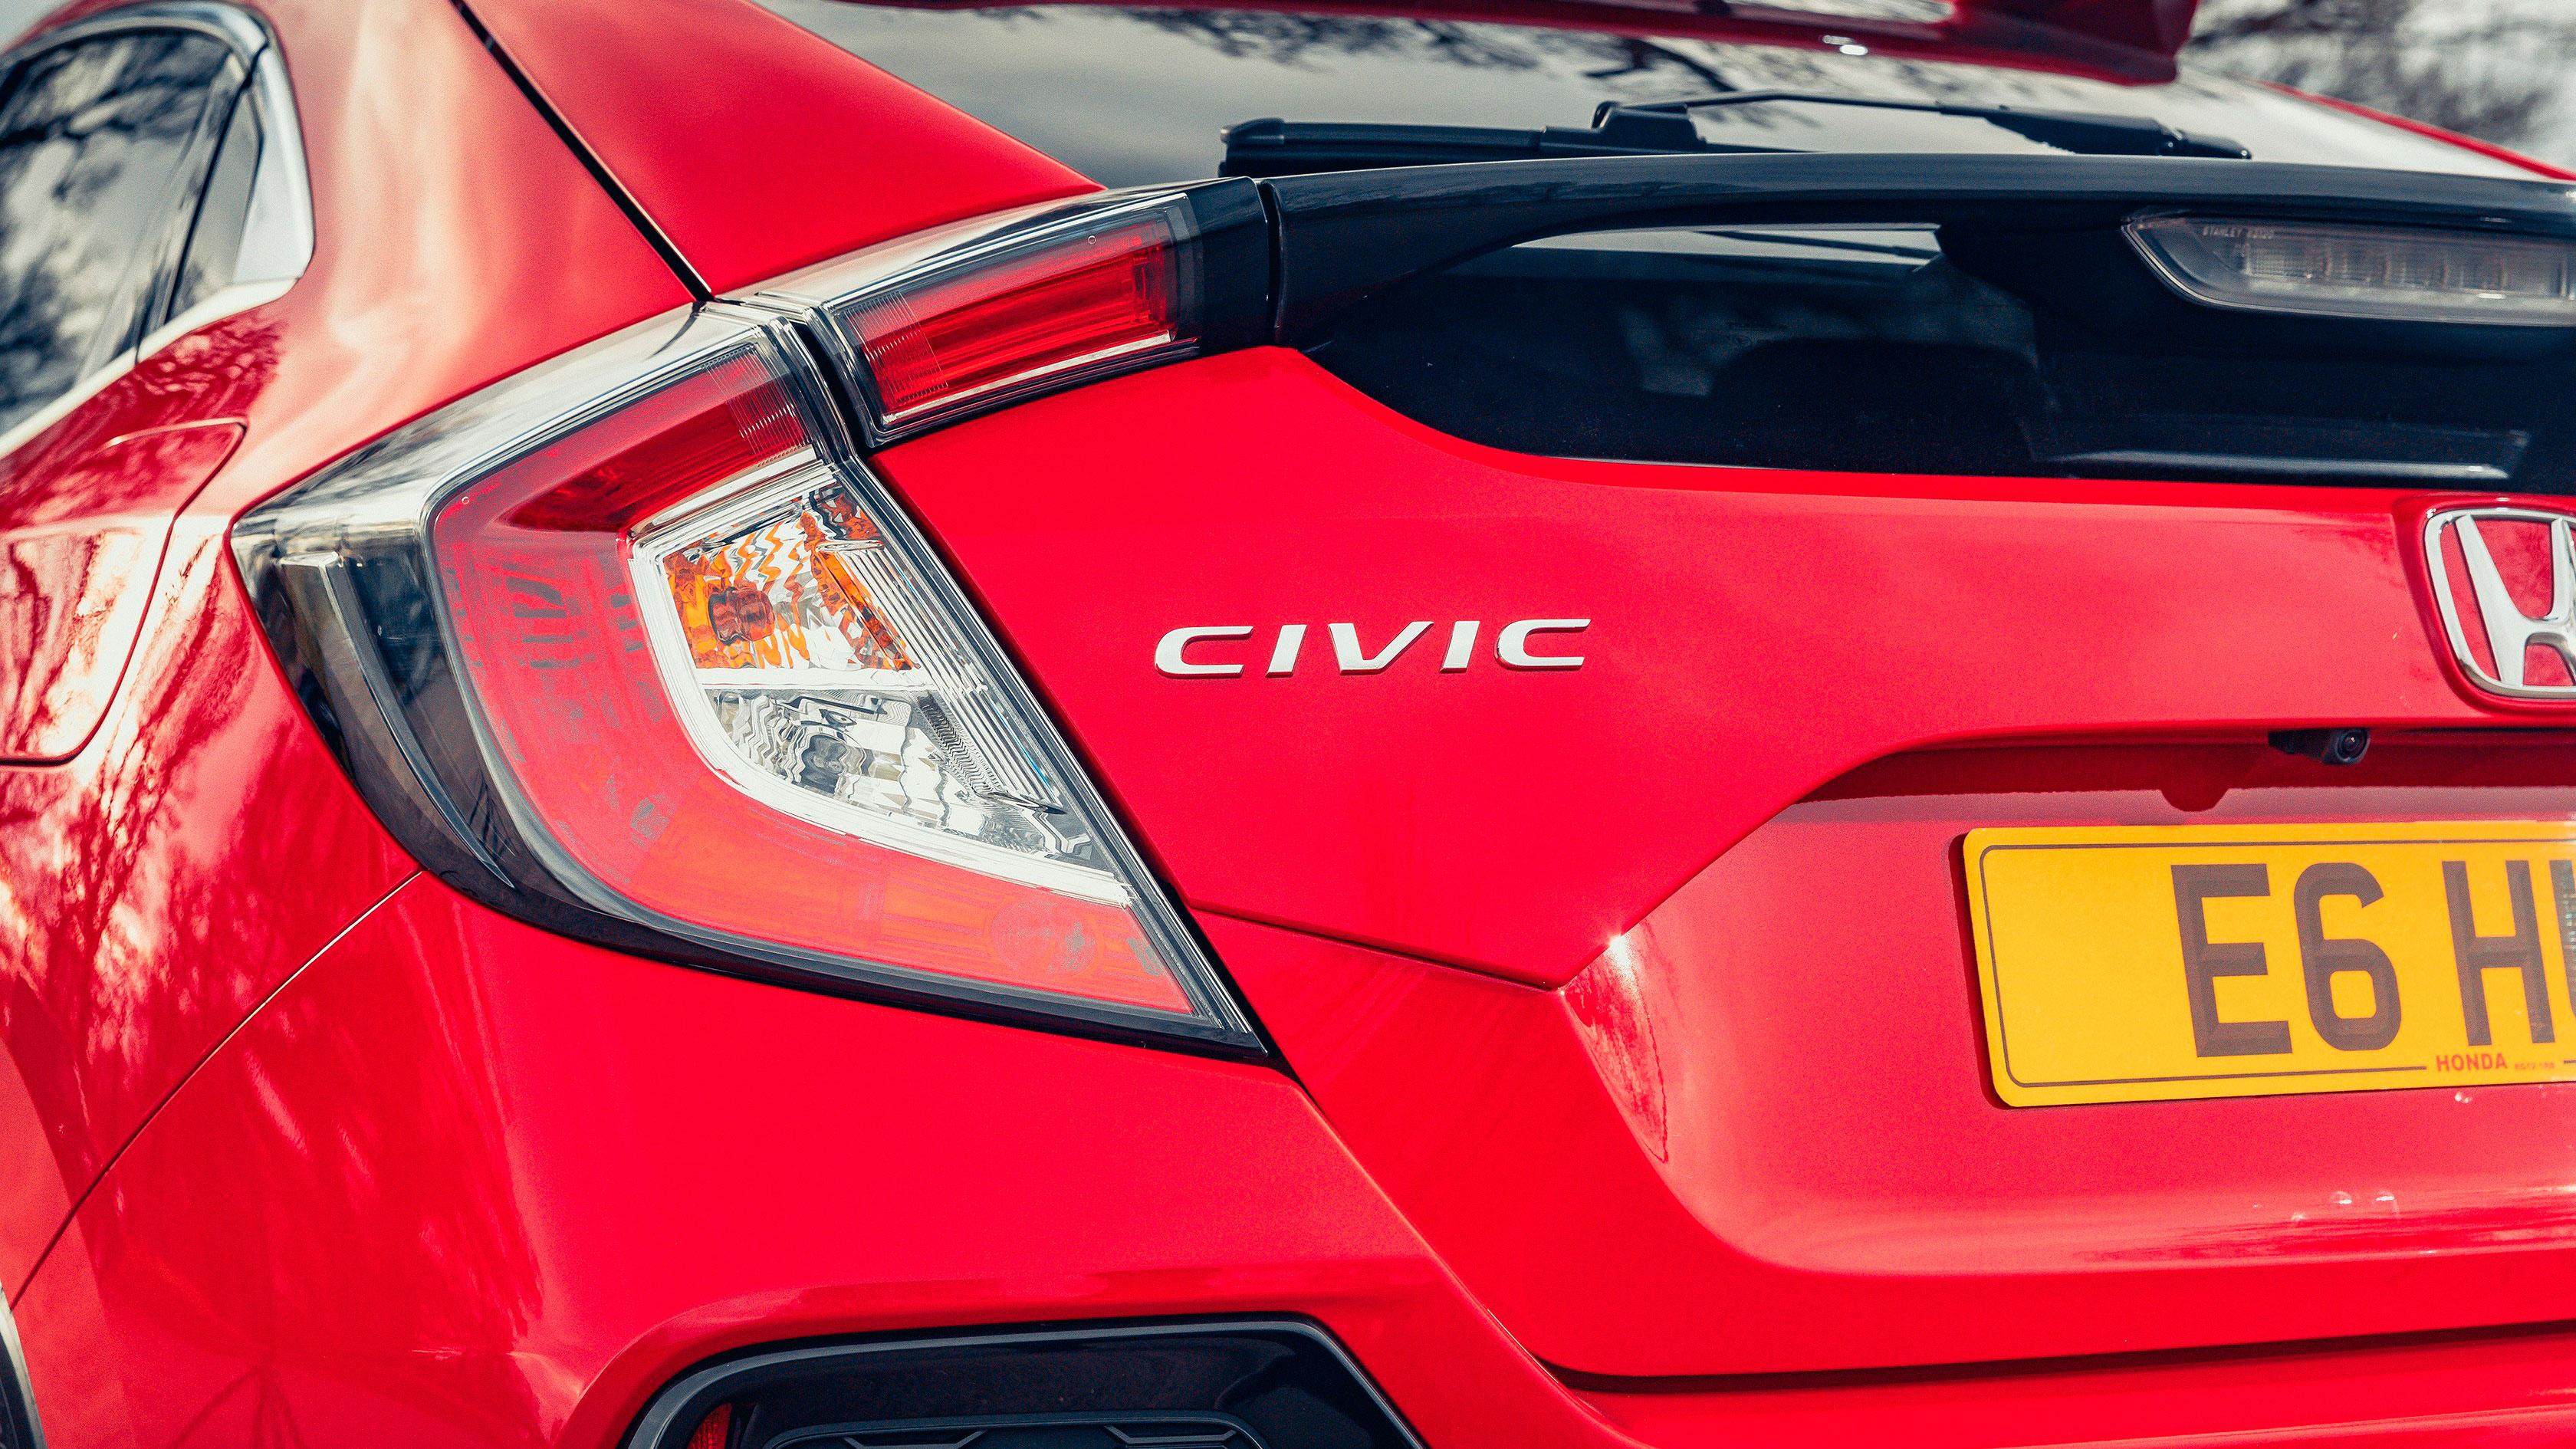 Honda Civic 1.0 vtec turbo rear lights